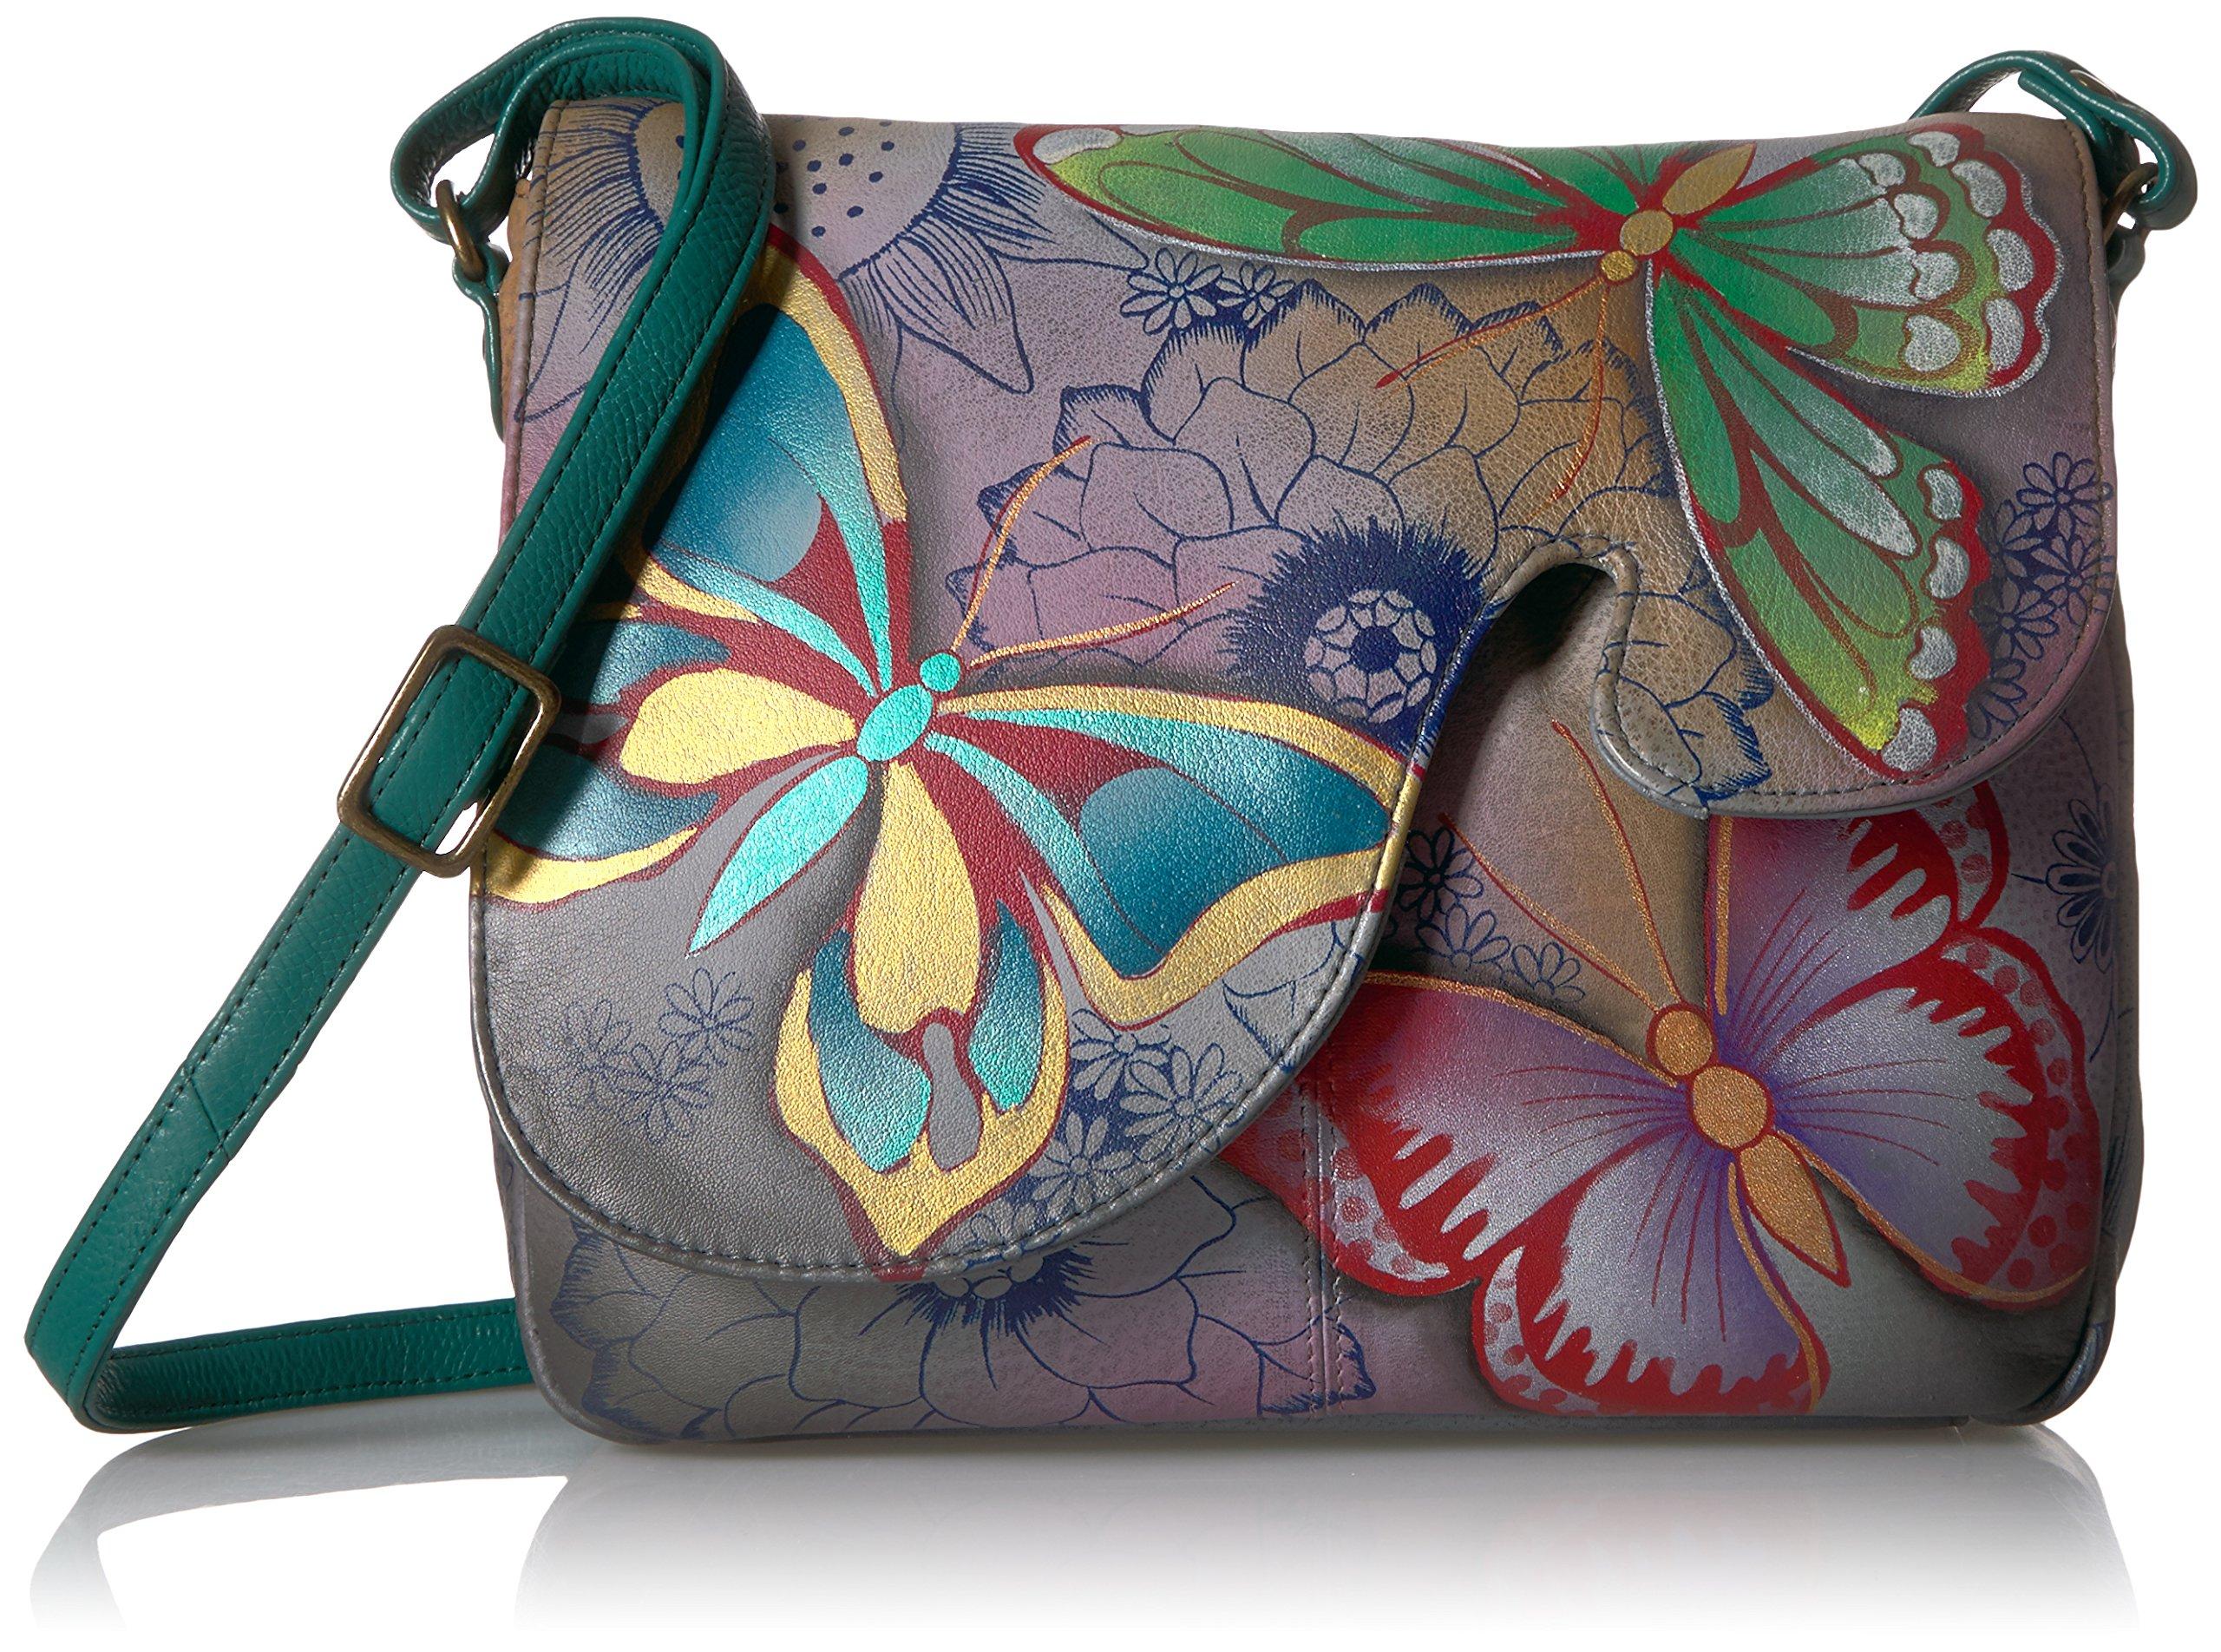 Anuschka Anna Handpainted Leather Women's Convertible Shoulder Bag